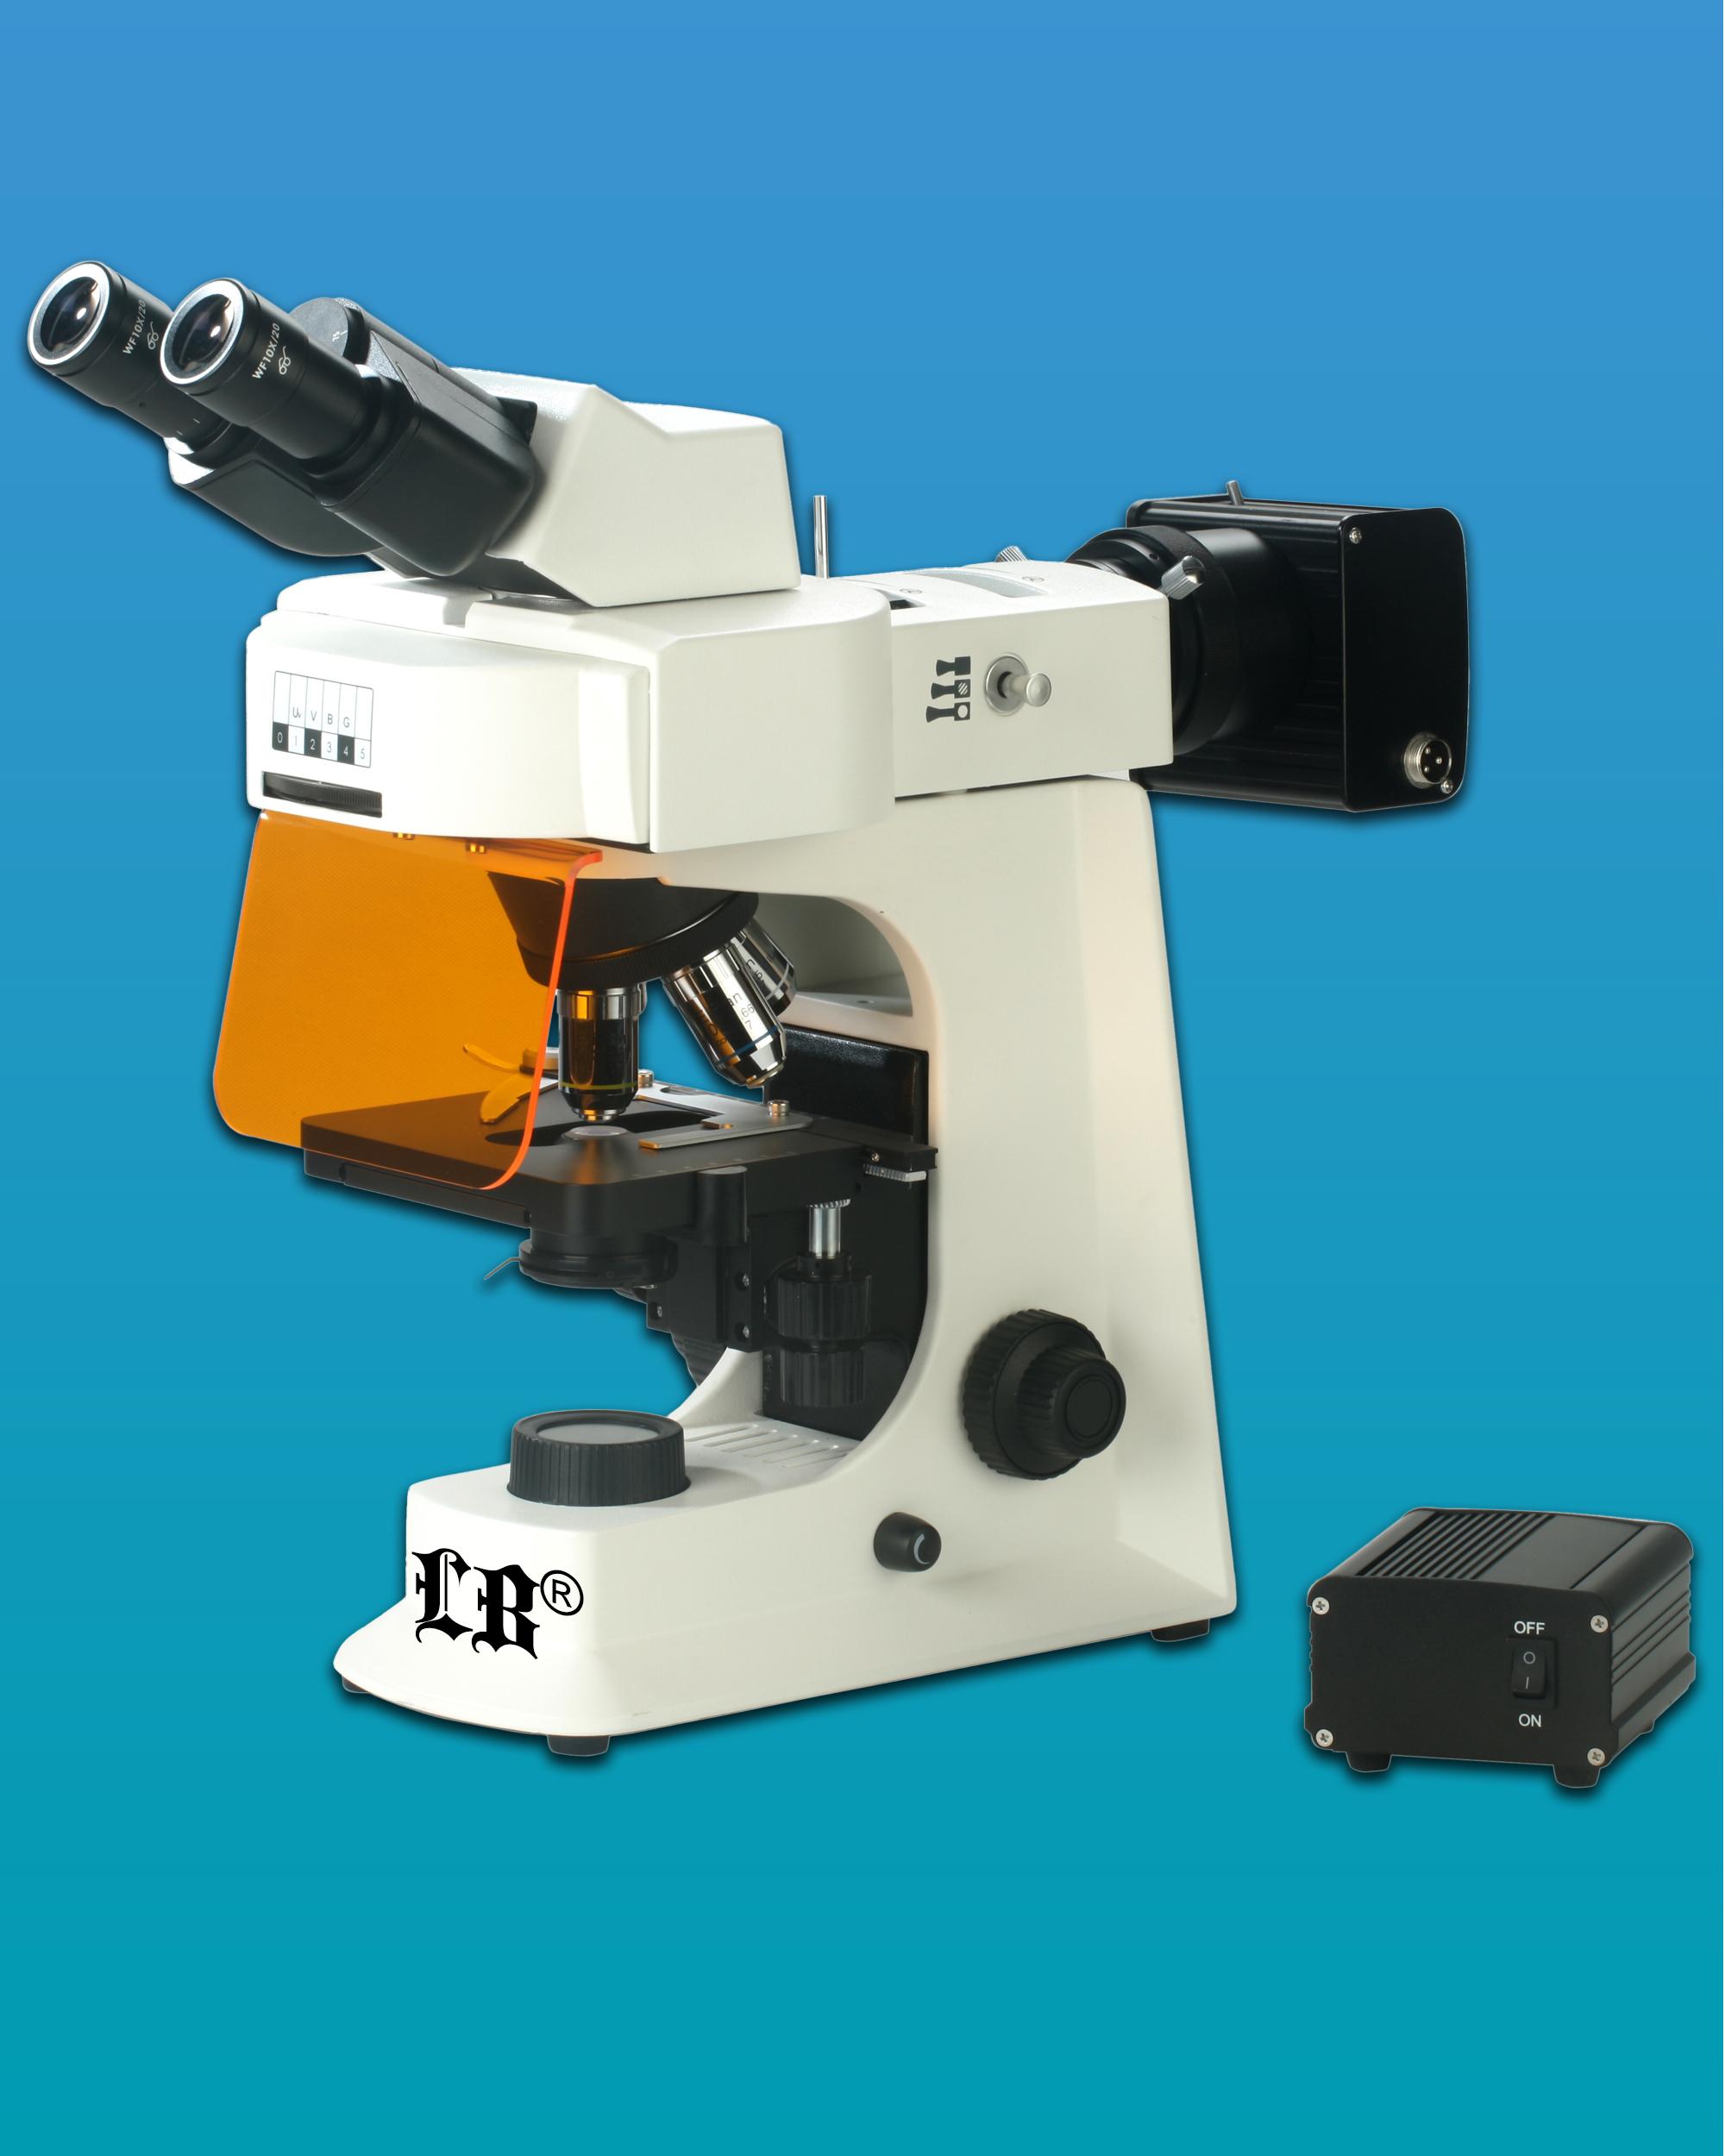 [LB-263] Biological Binocular Flourescent Microscope w/ LED Illumination &  Infinite Optical System